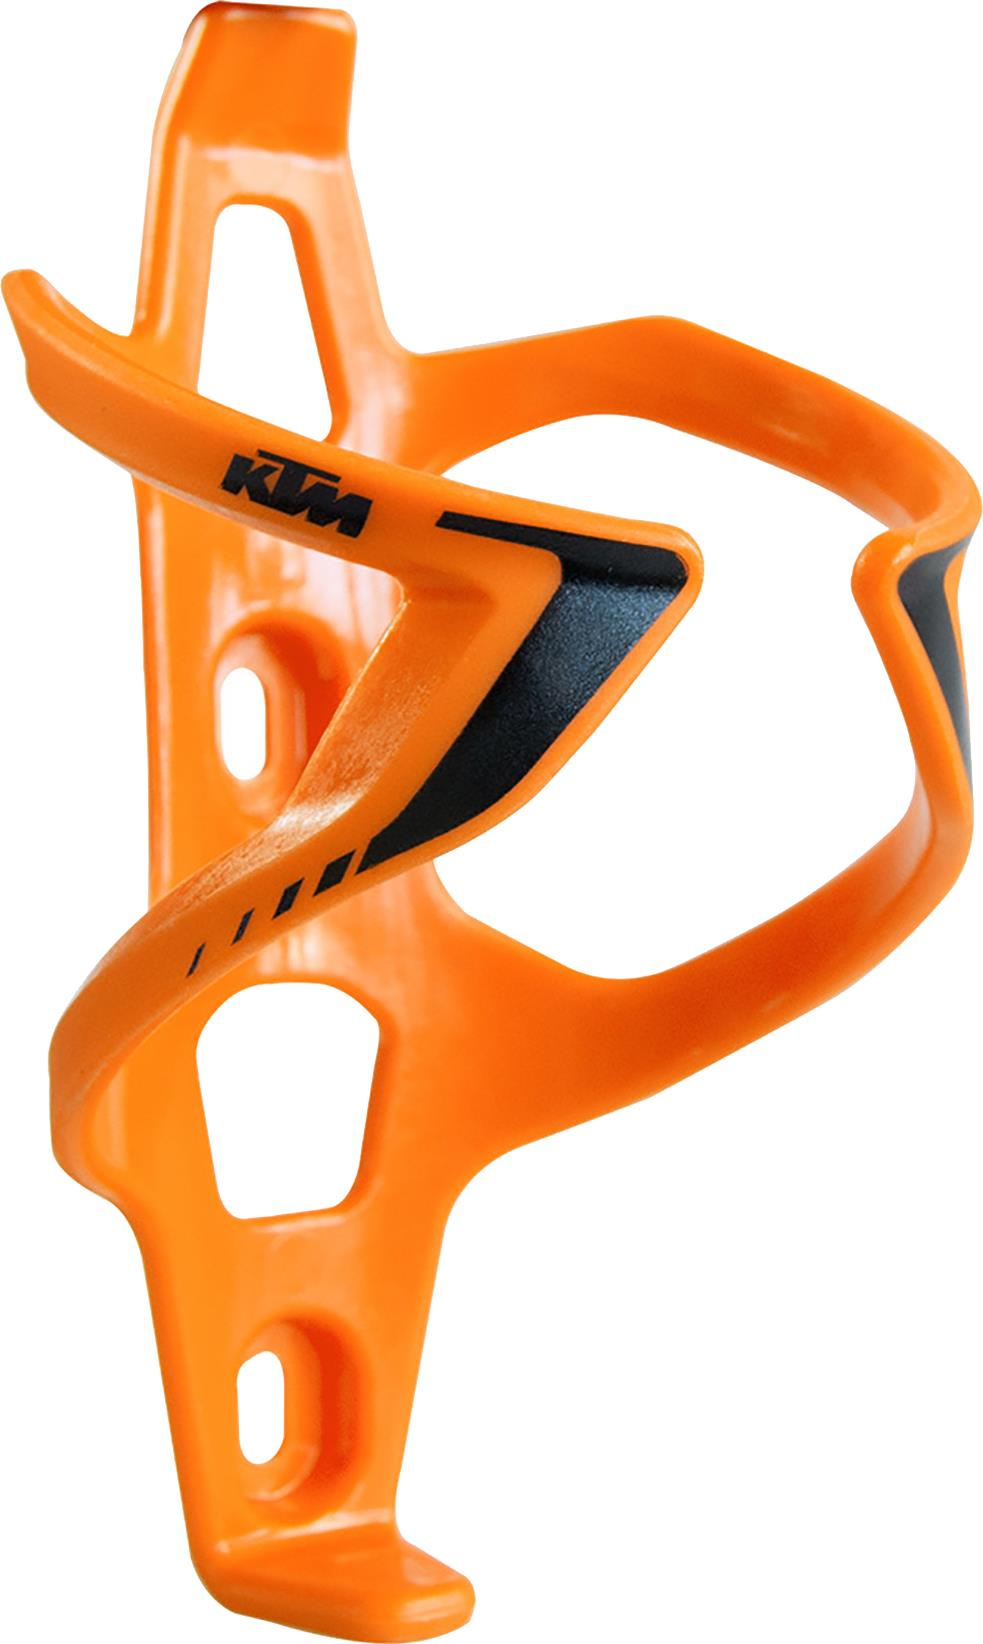 KTM košík na lahev Wing II oranžový